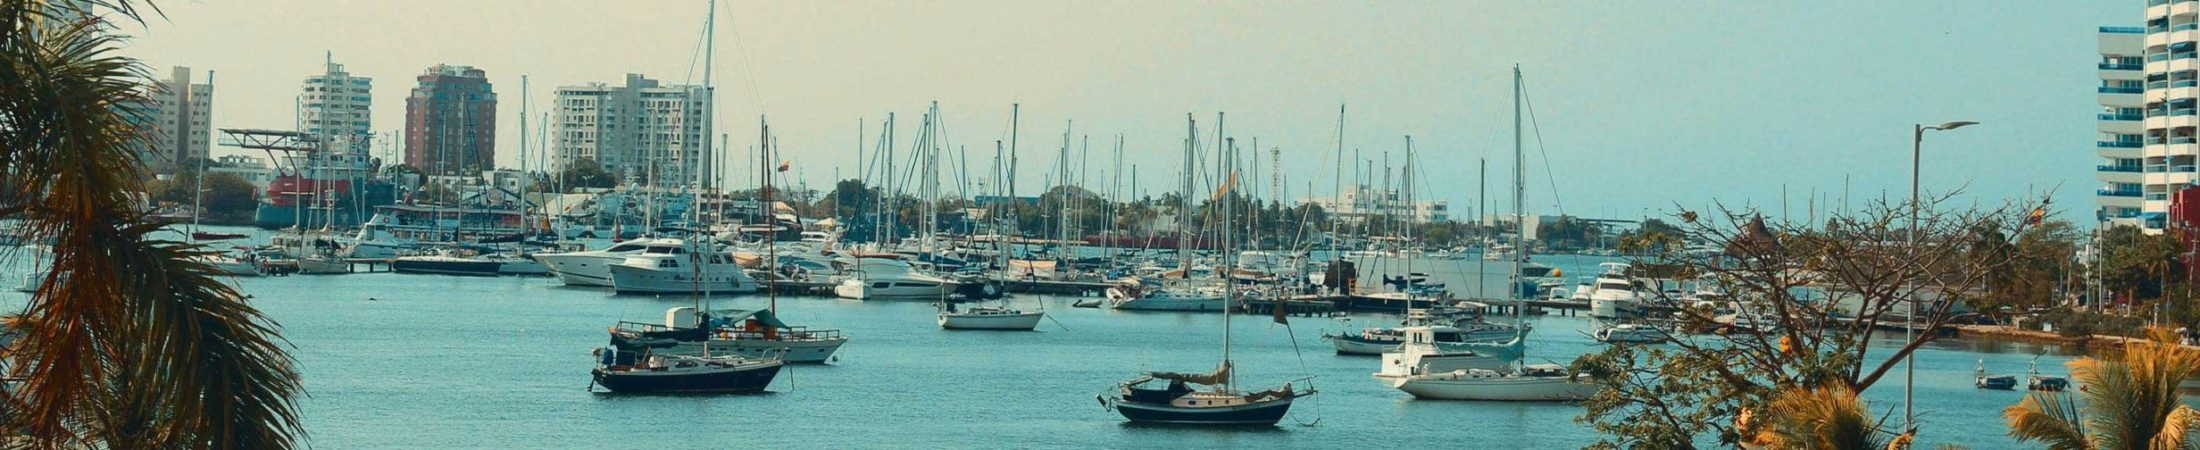 Private Boat Tours Cartagena de Indias 2020